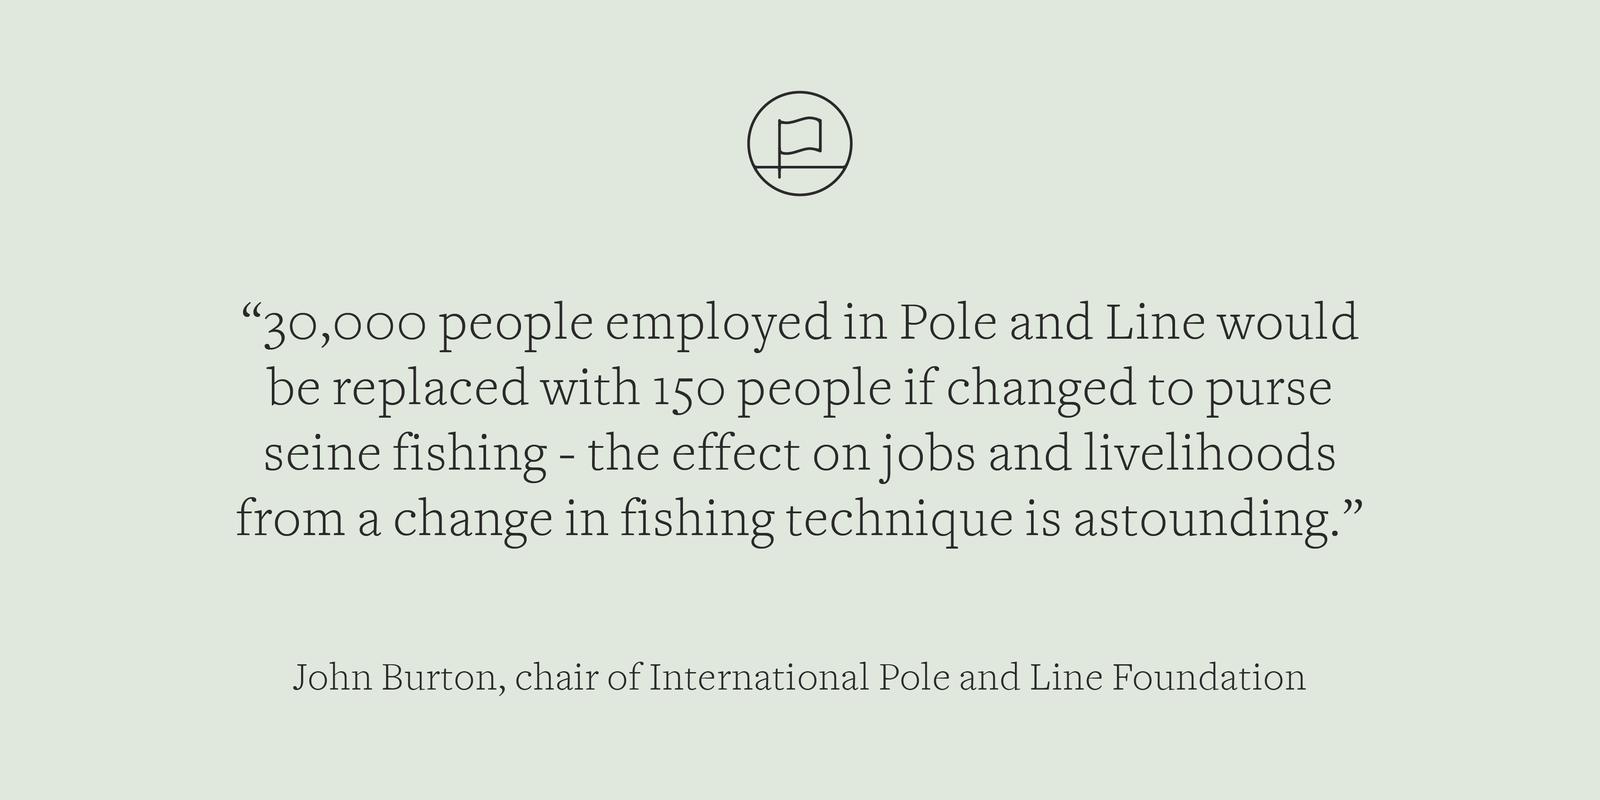 Purse and pole fishing